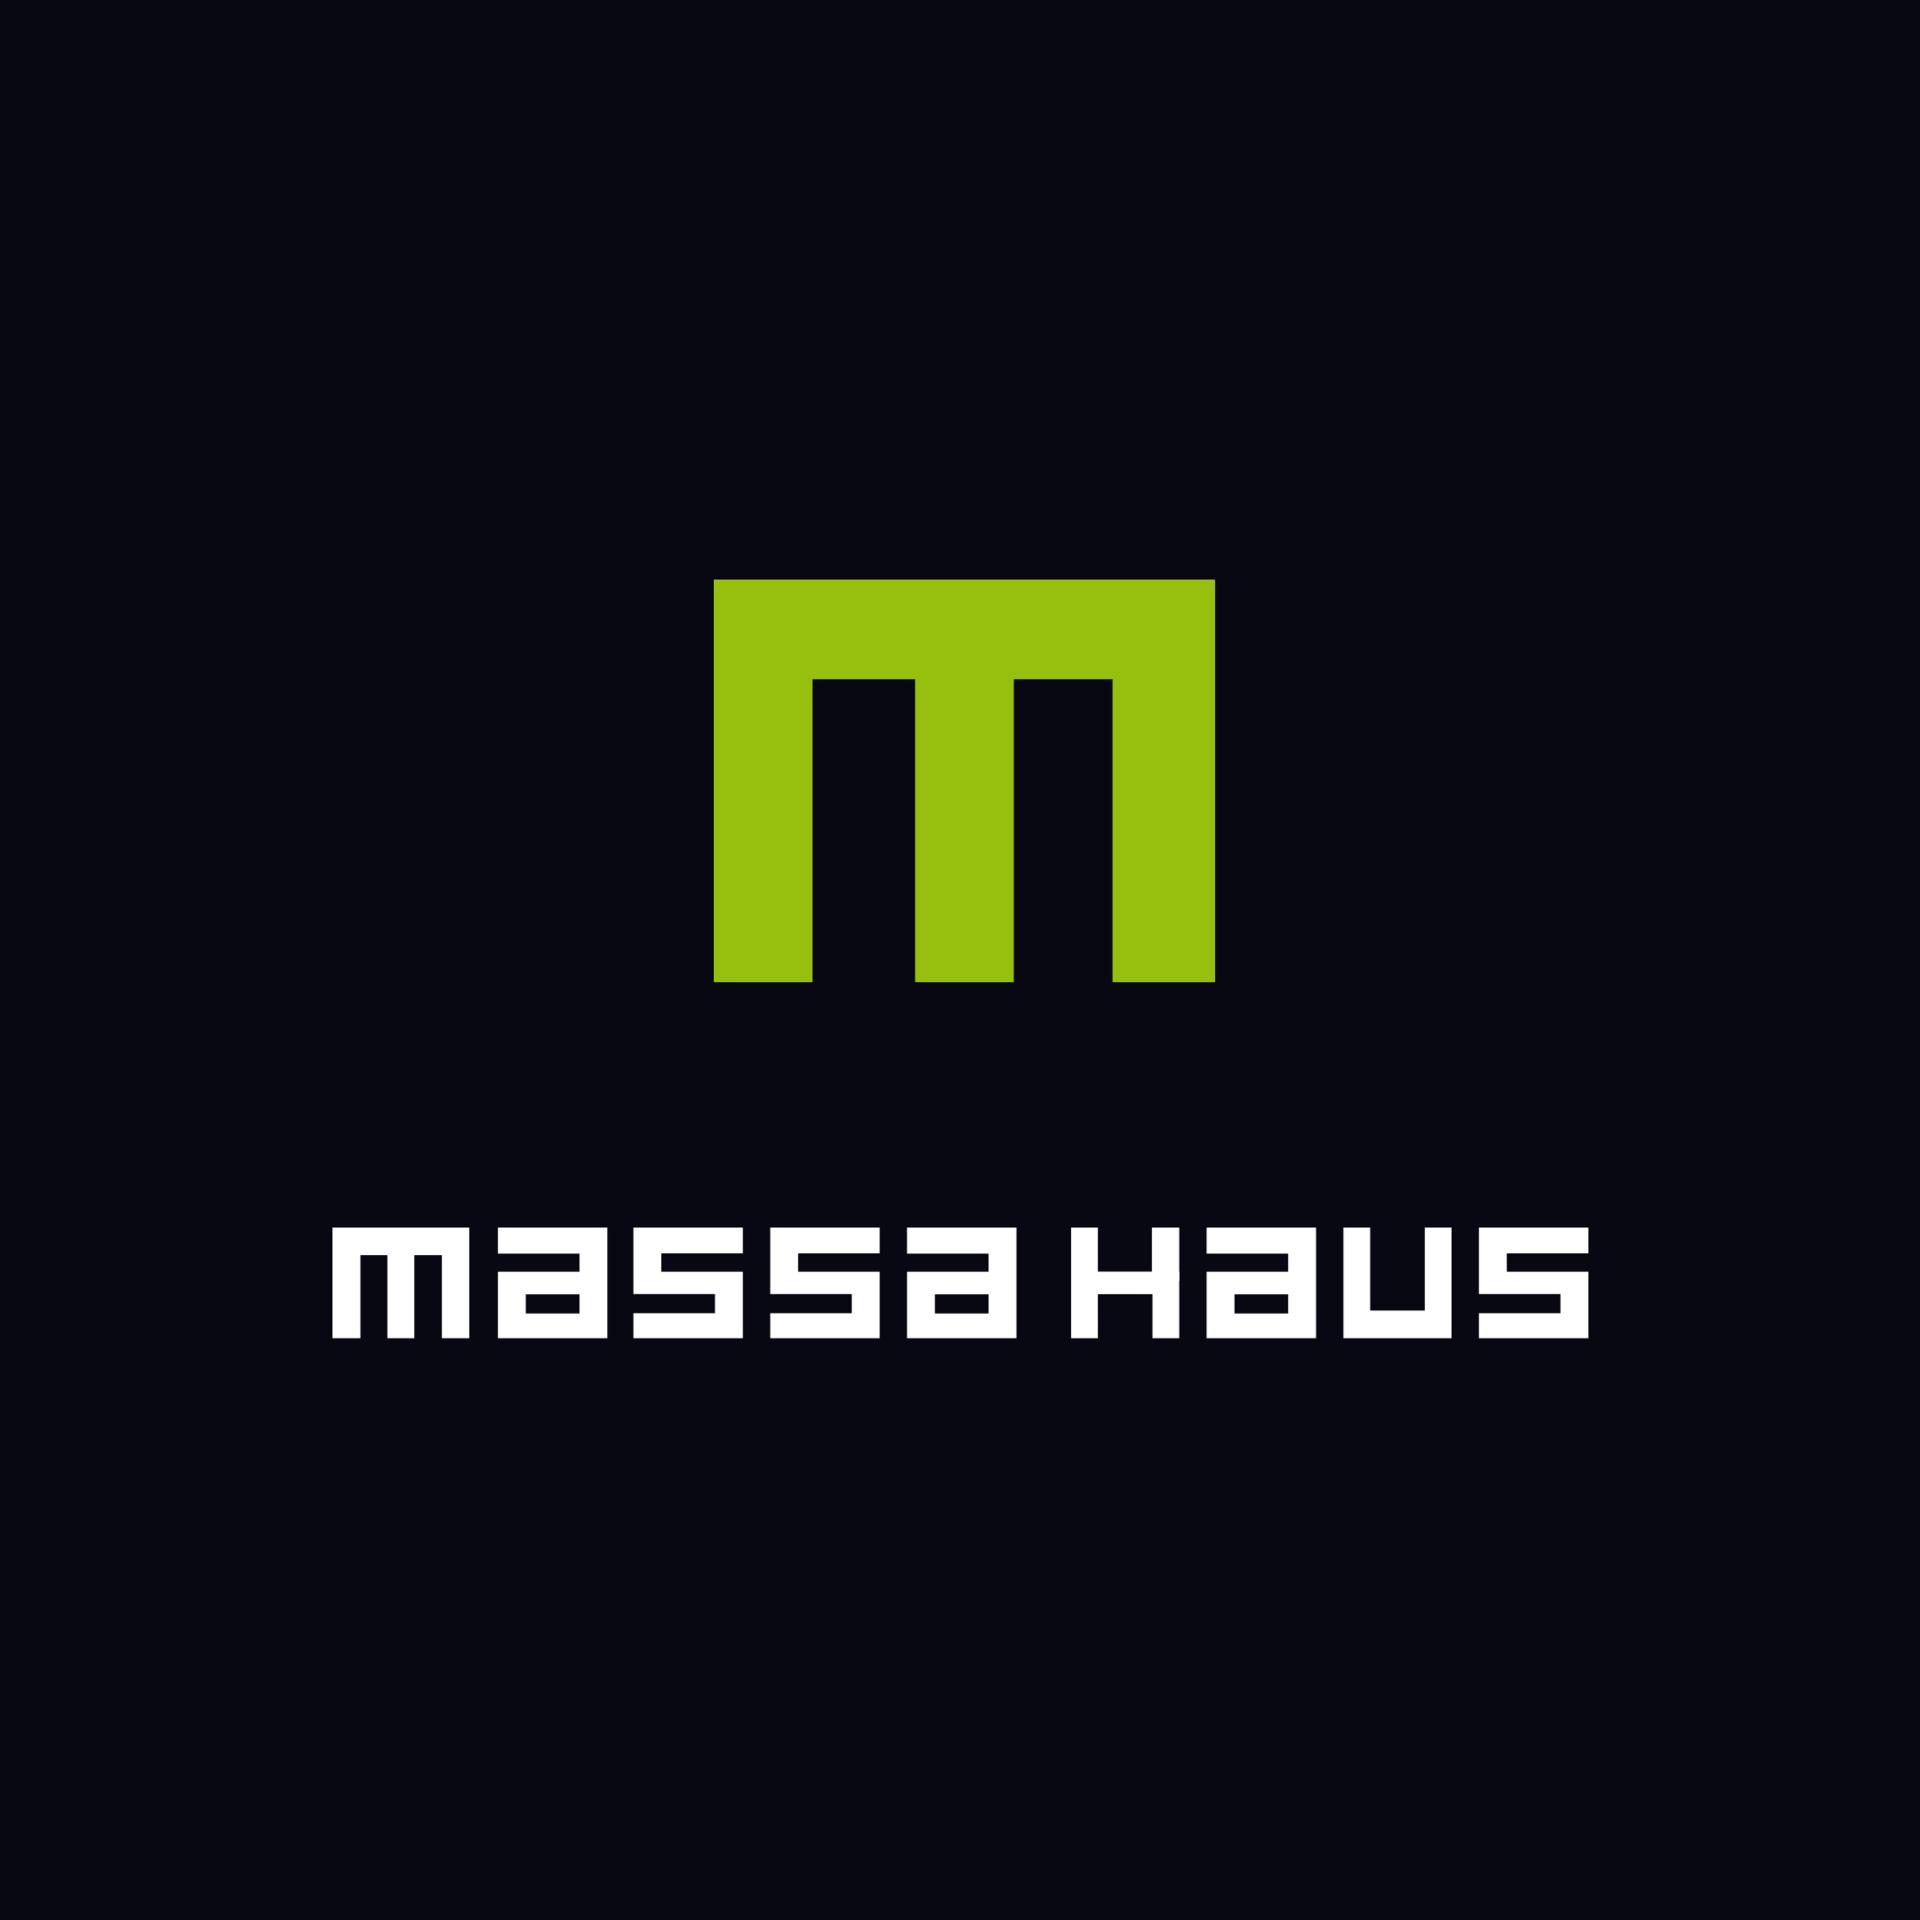 massahaus Marcel Block